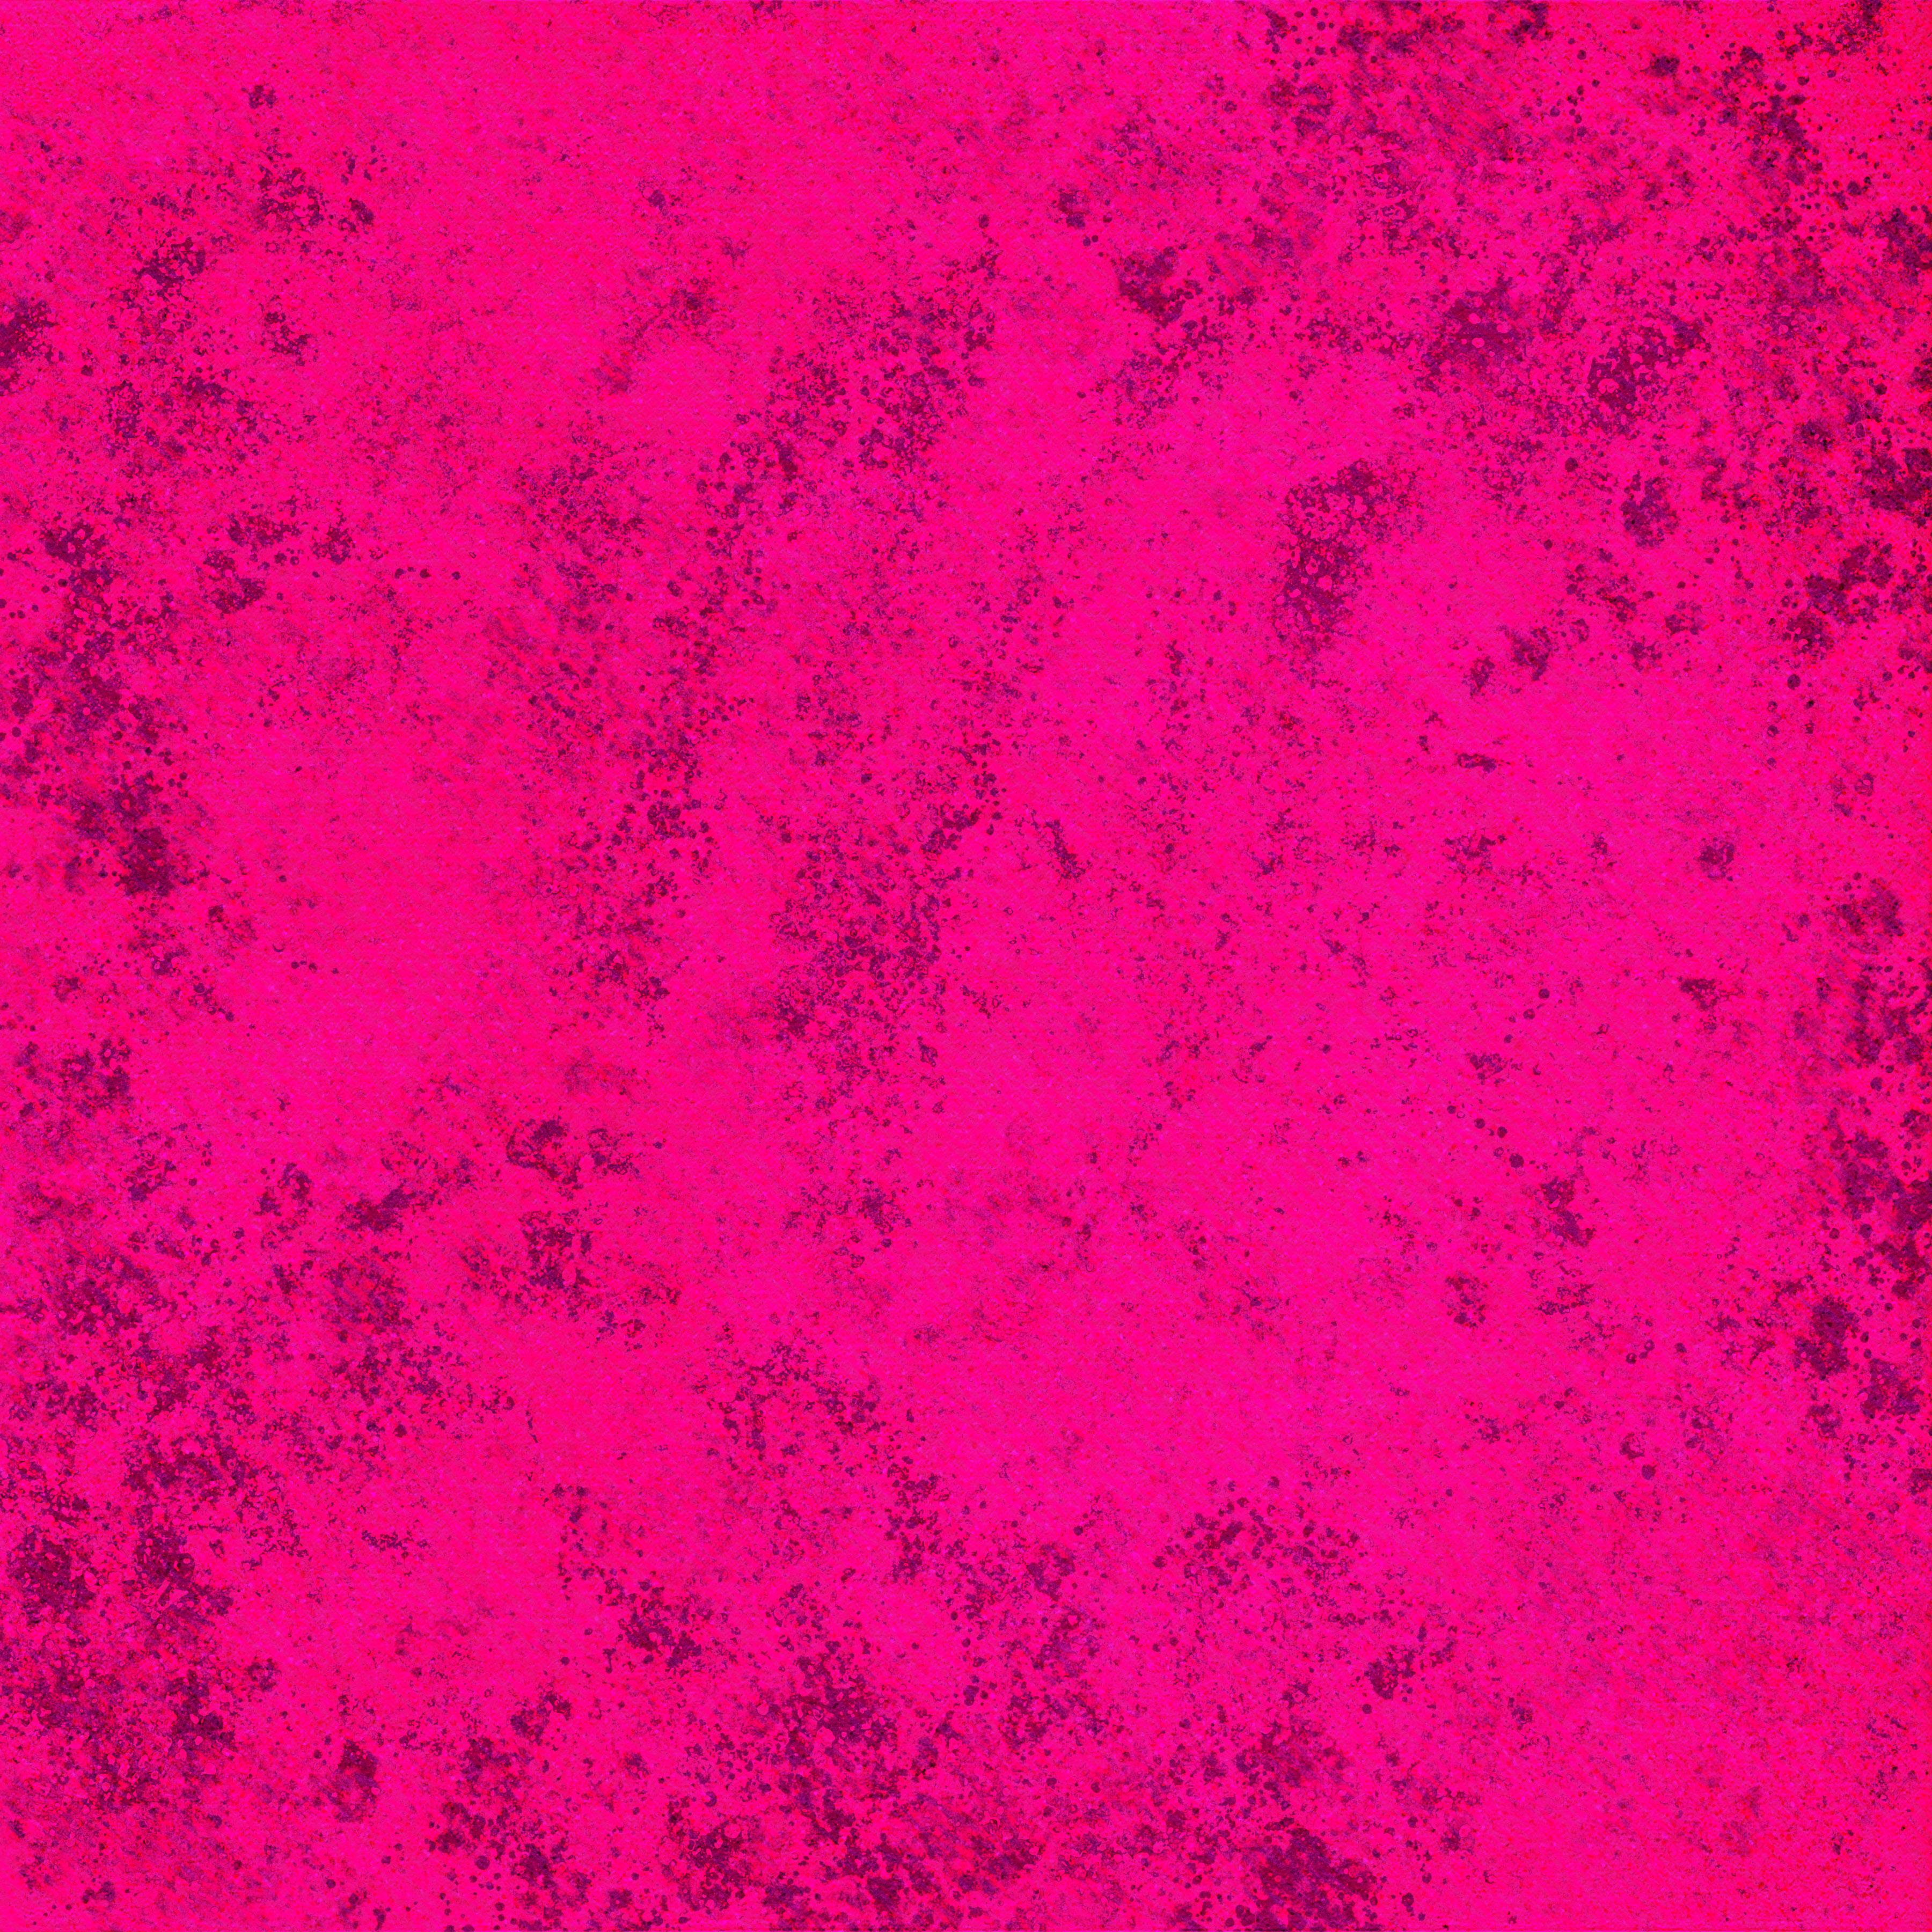 freebie hot pink background texture � hg designs